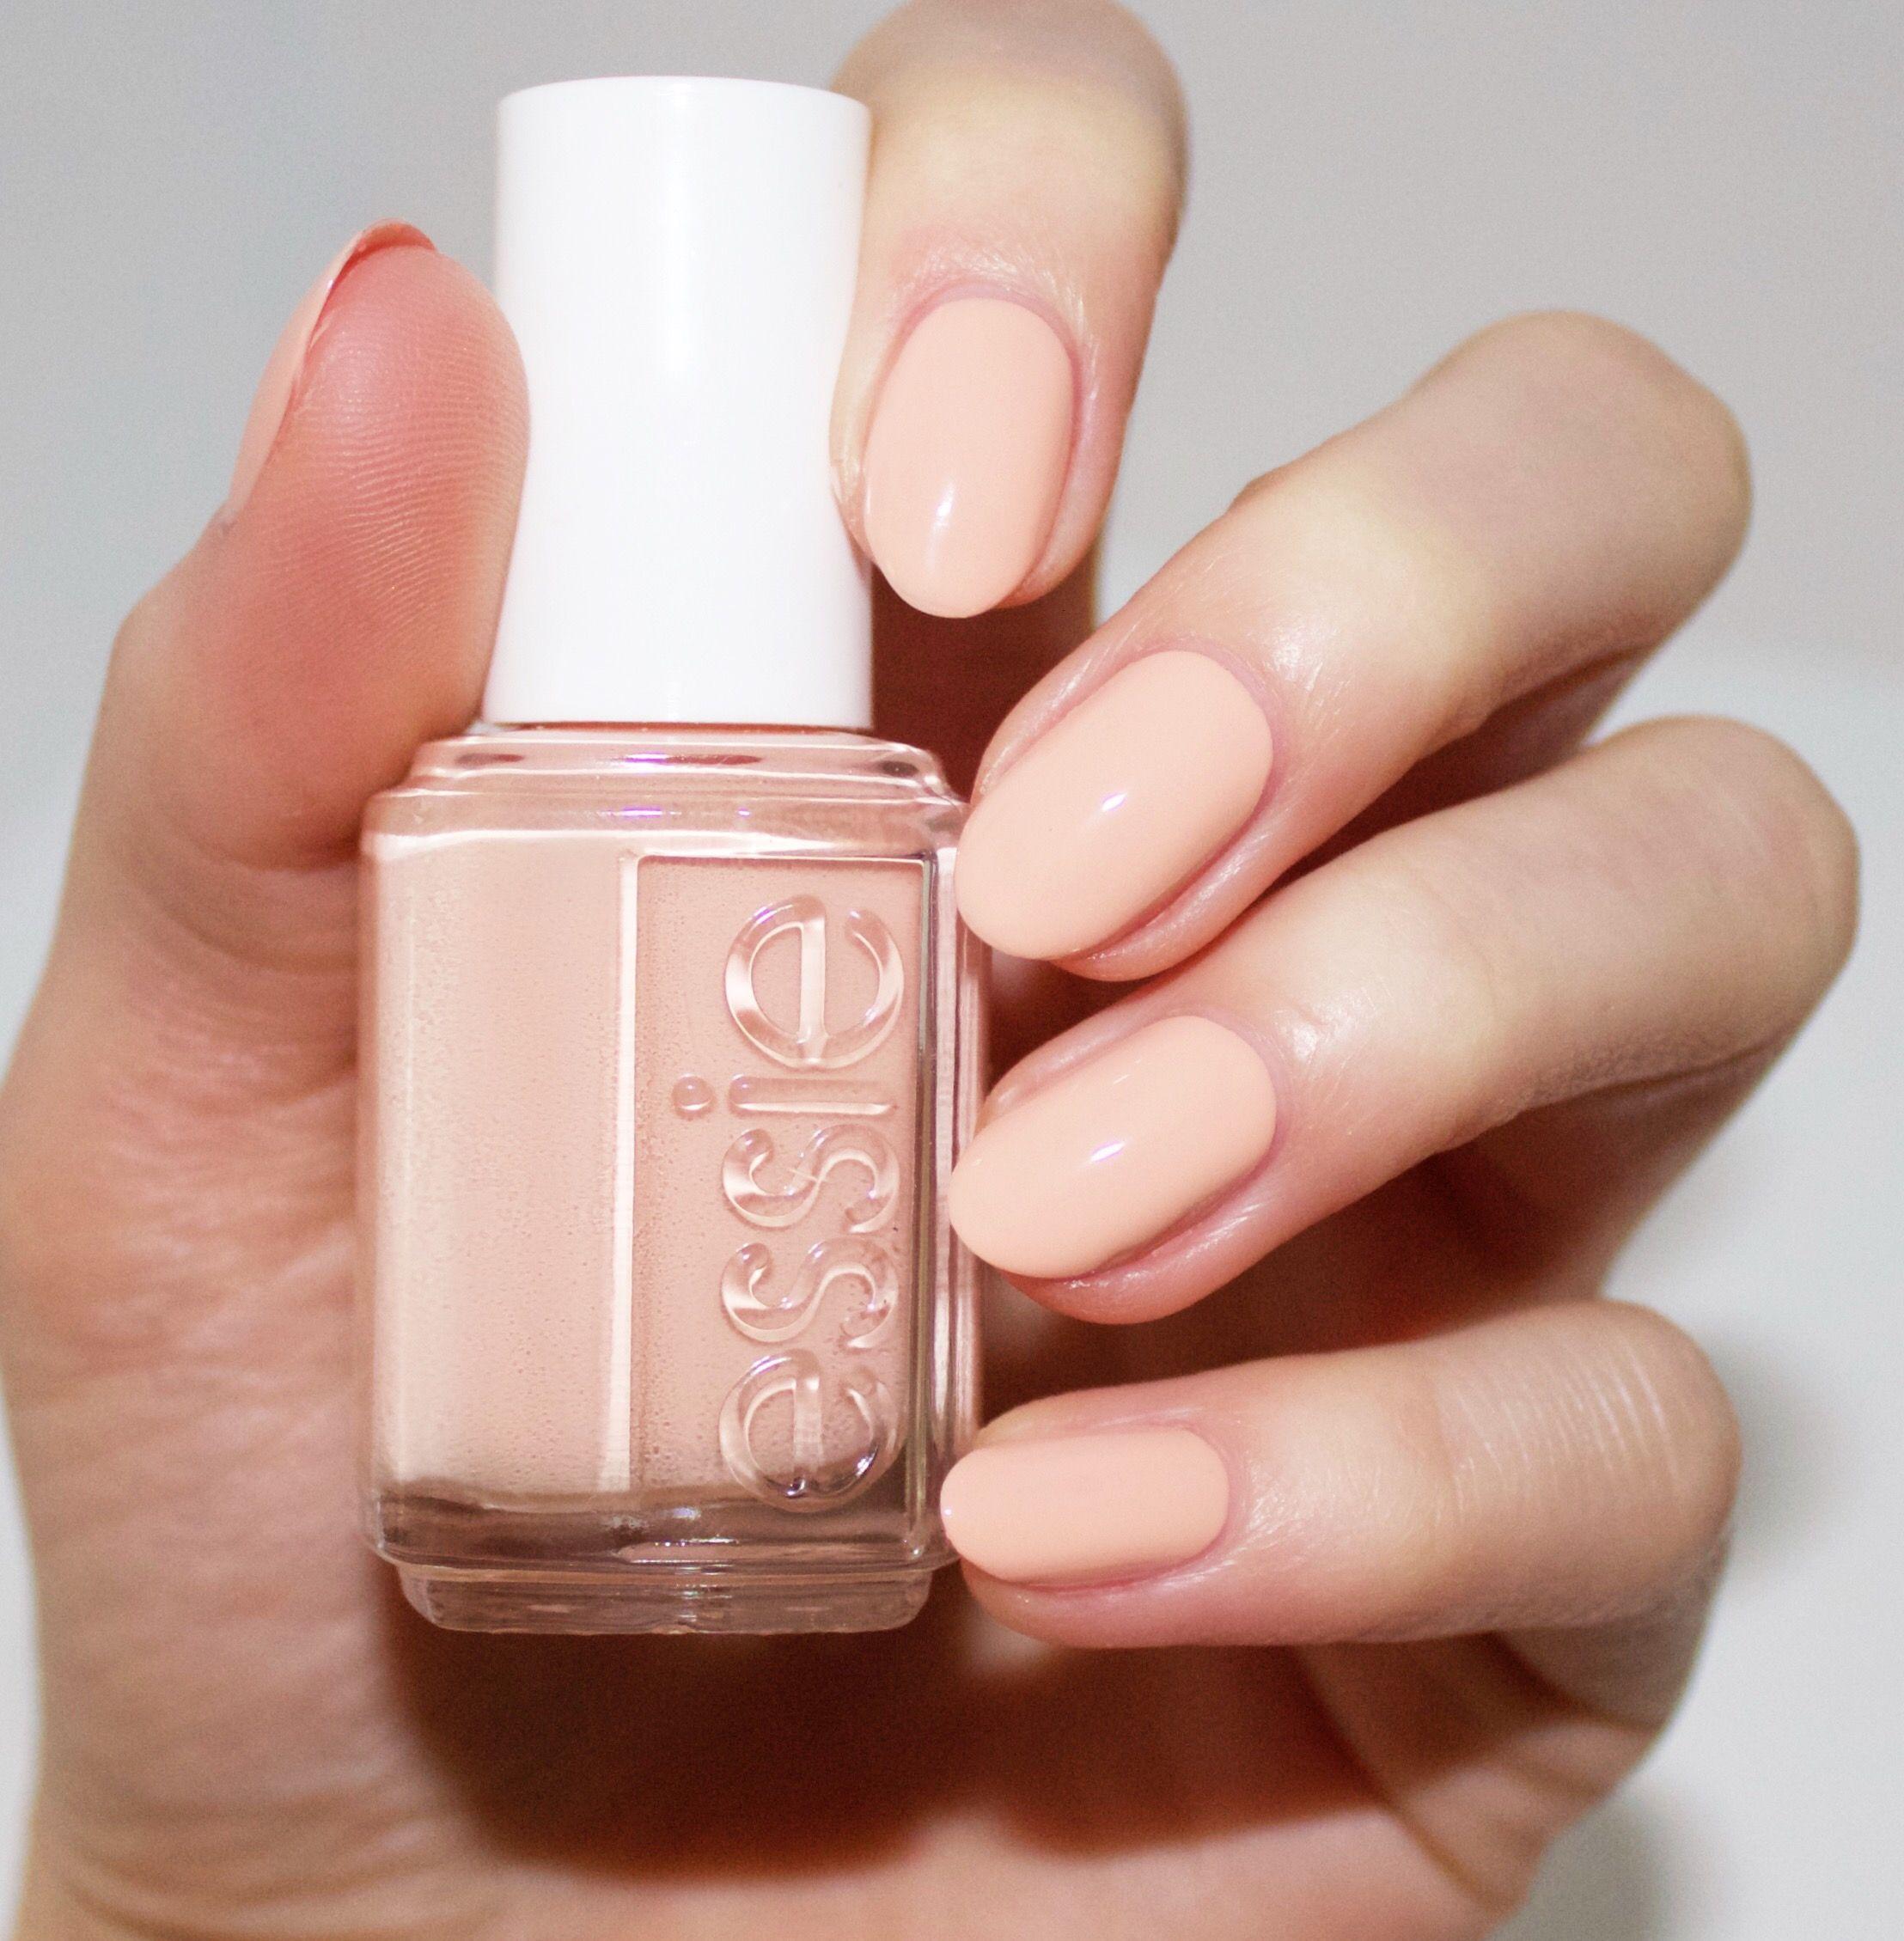 Essie spring 2016 collection - high class affair - blush nude nail ...